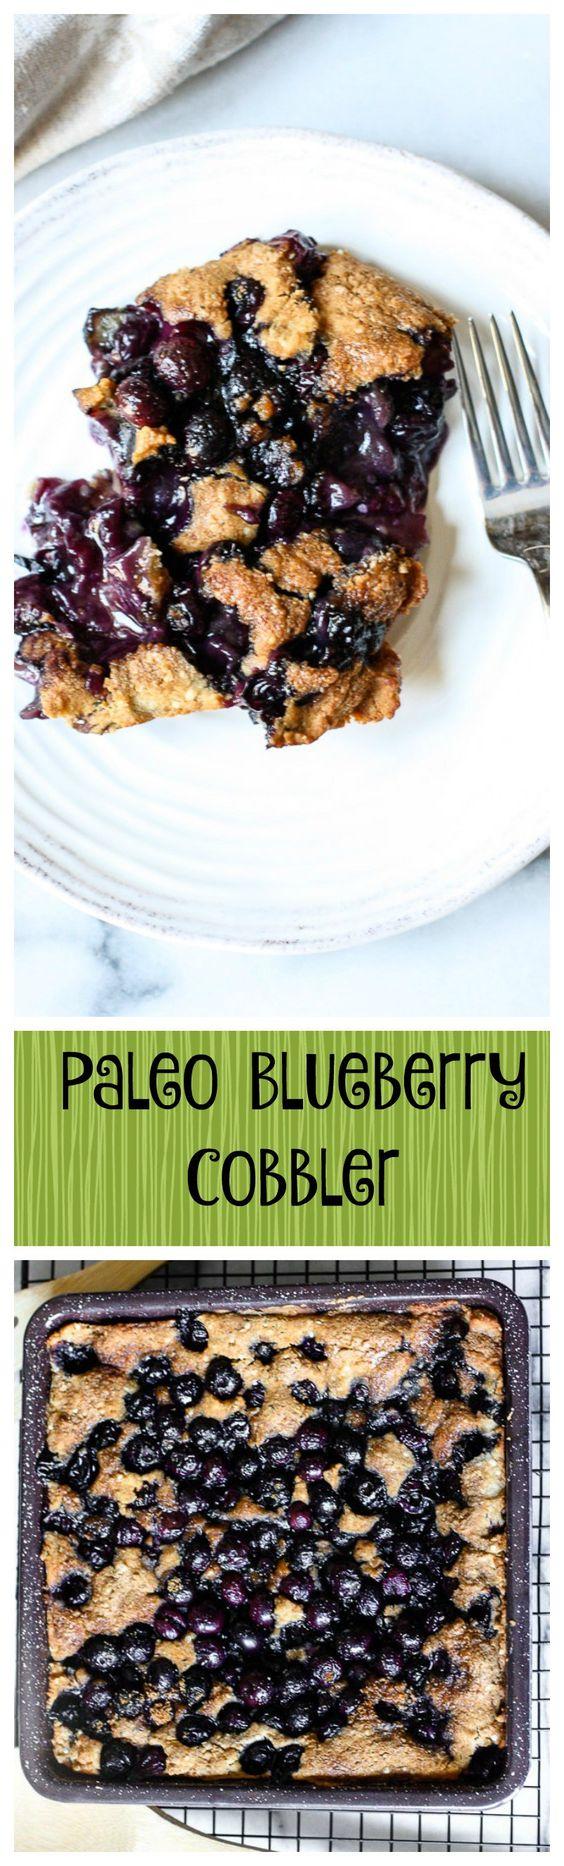 paleo-buleberry-cobbler-gluten-free